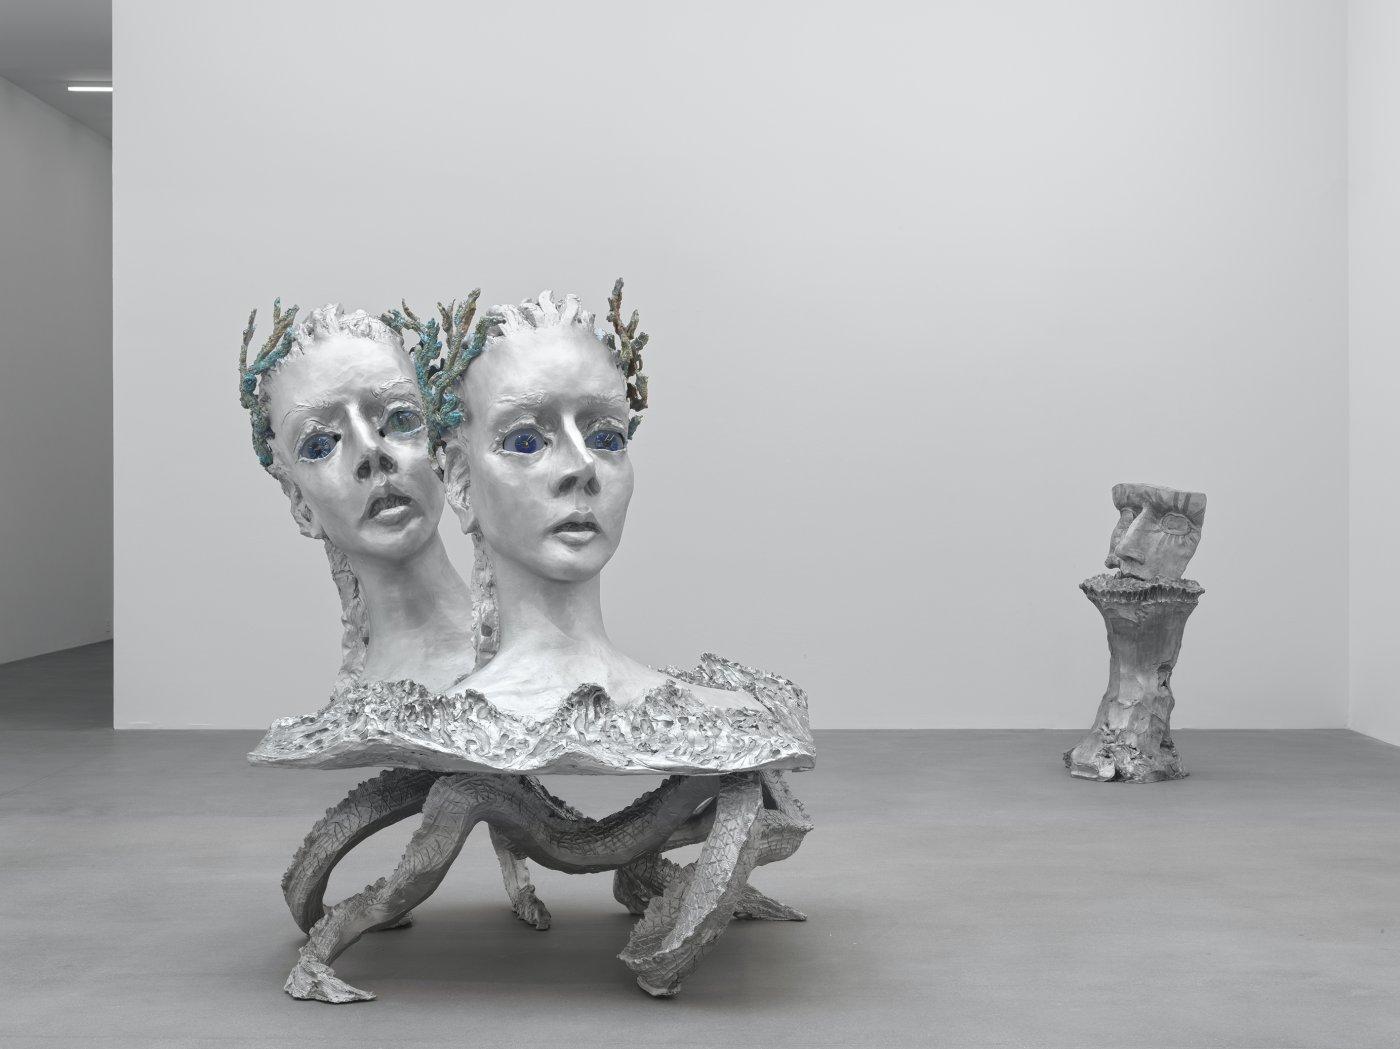 Galerie Eva Presenhuber Waldmanstrasse Jean-Marie Appriou 2